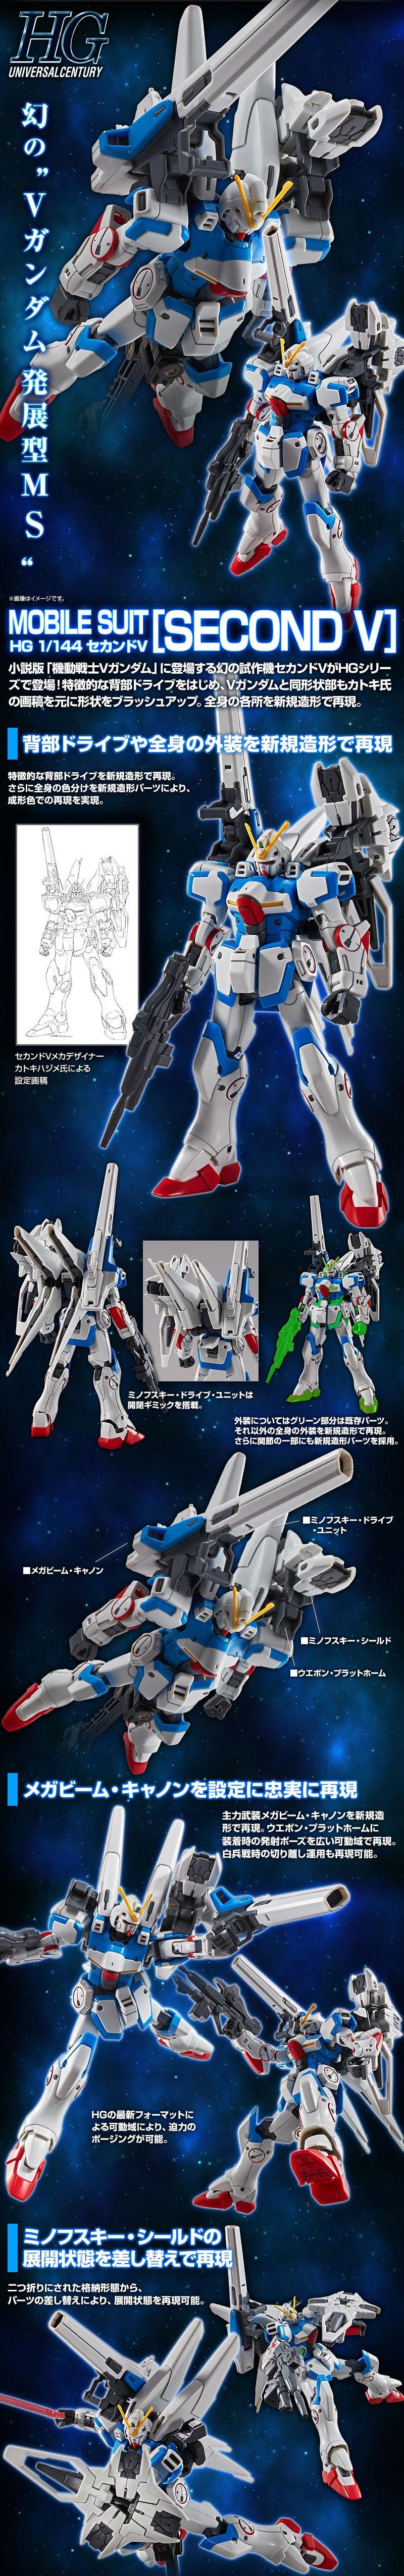 HGUC Second Victory Gundam Details